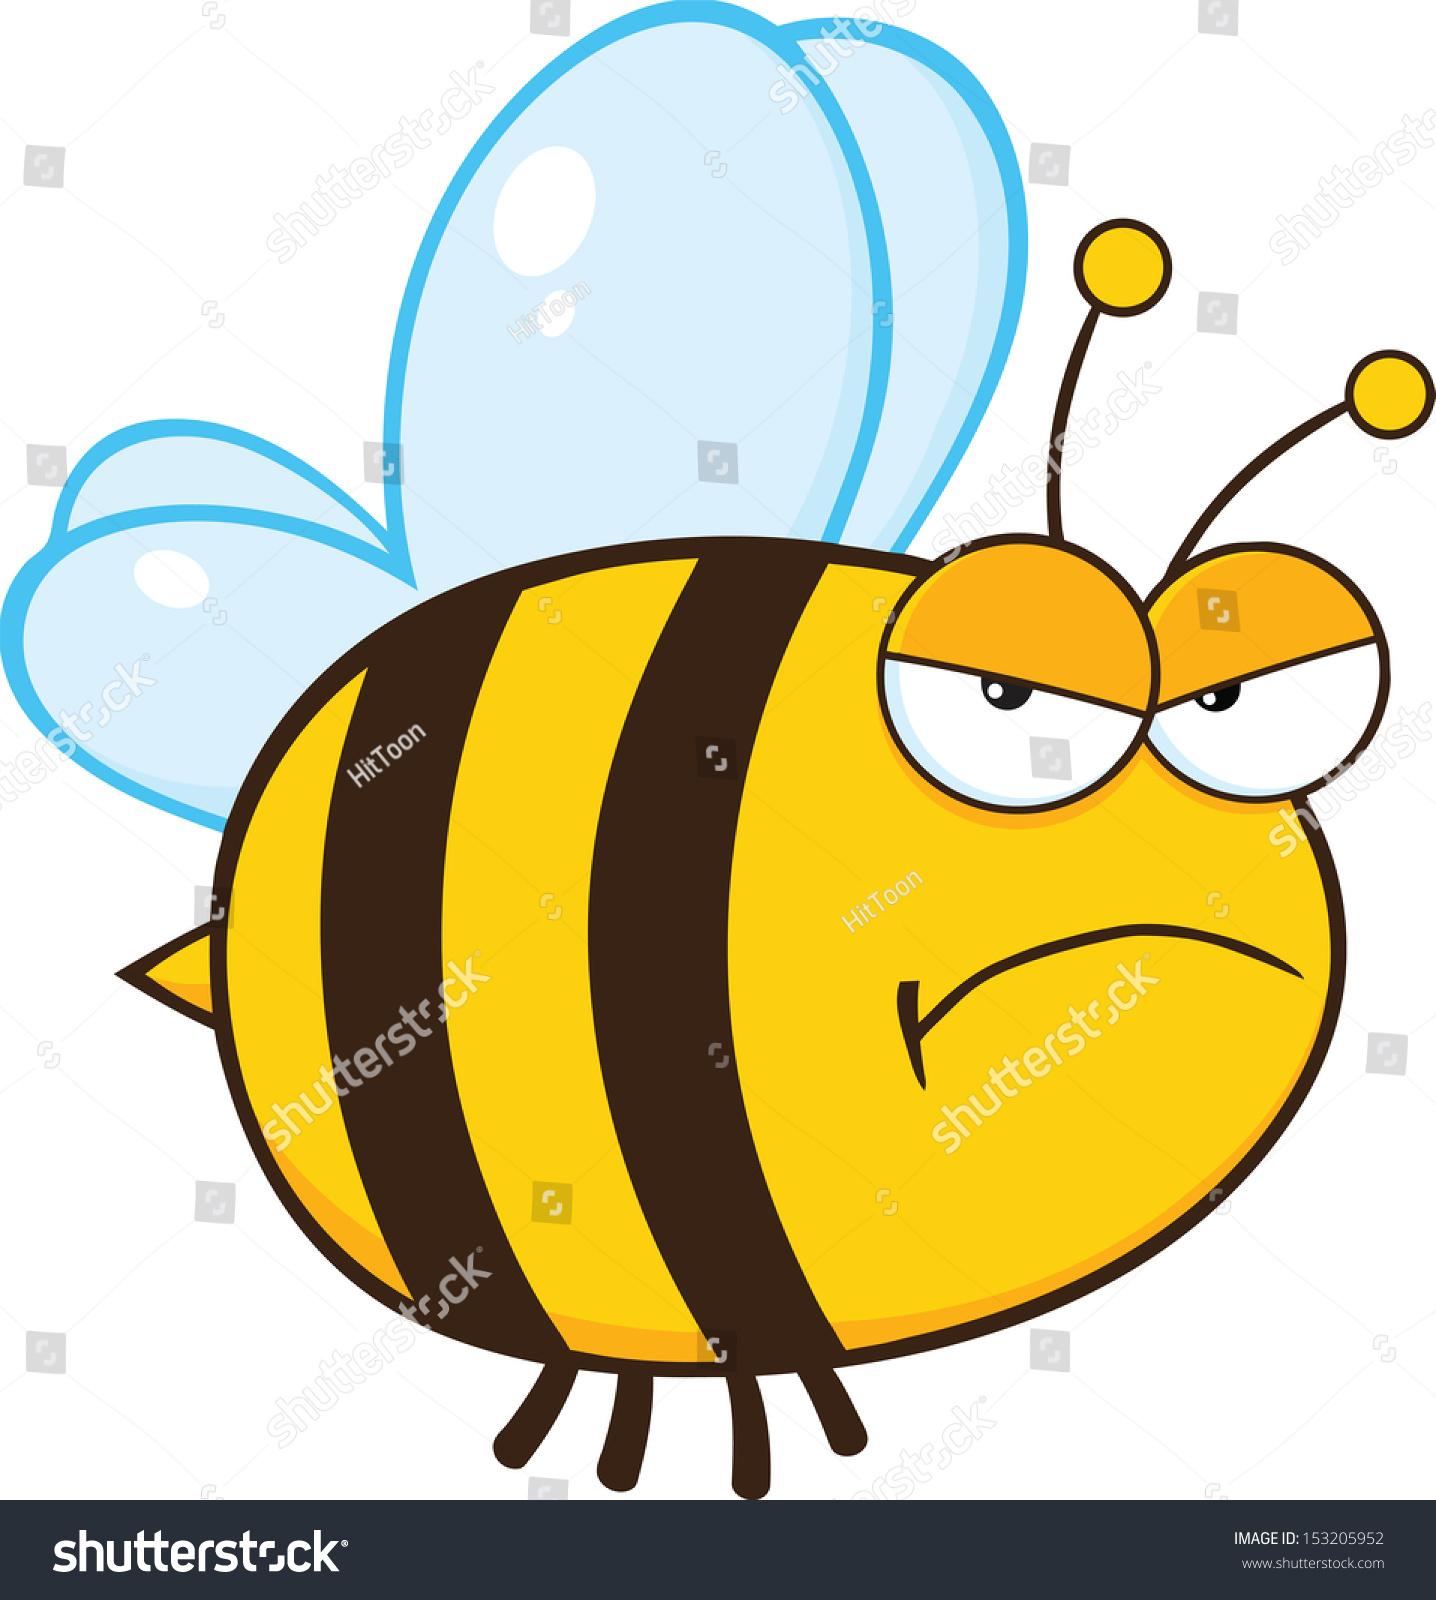 angry bumblebee cartoon - photo #10